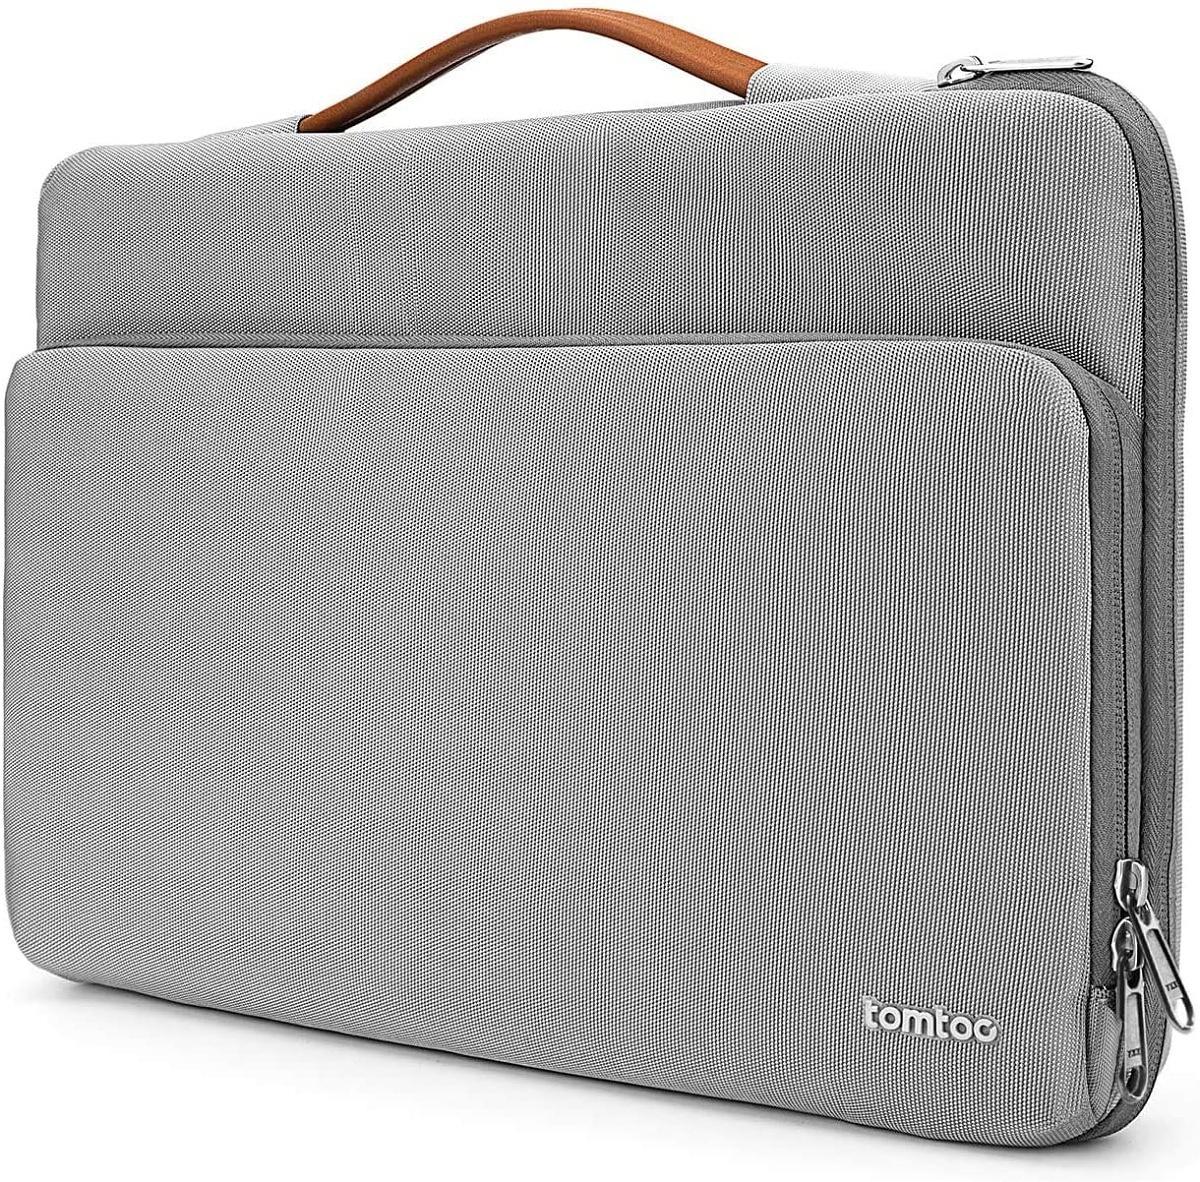 Tomtoc 노트북은 얼마입니까?